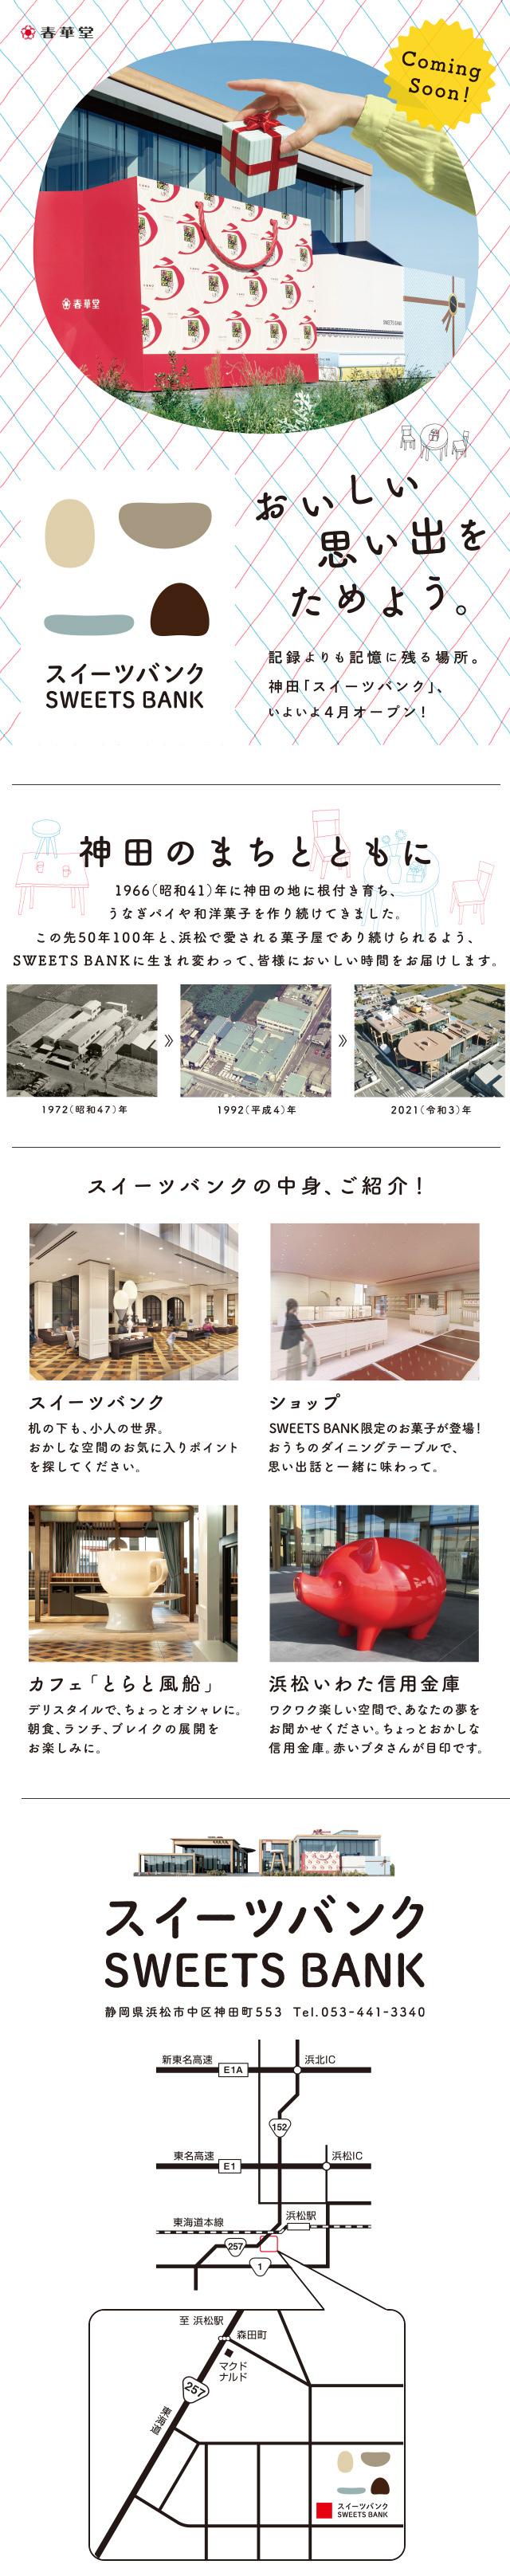 NEWS_image_sph_sweetsbankOPEN_20210305.jpg